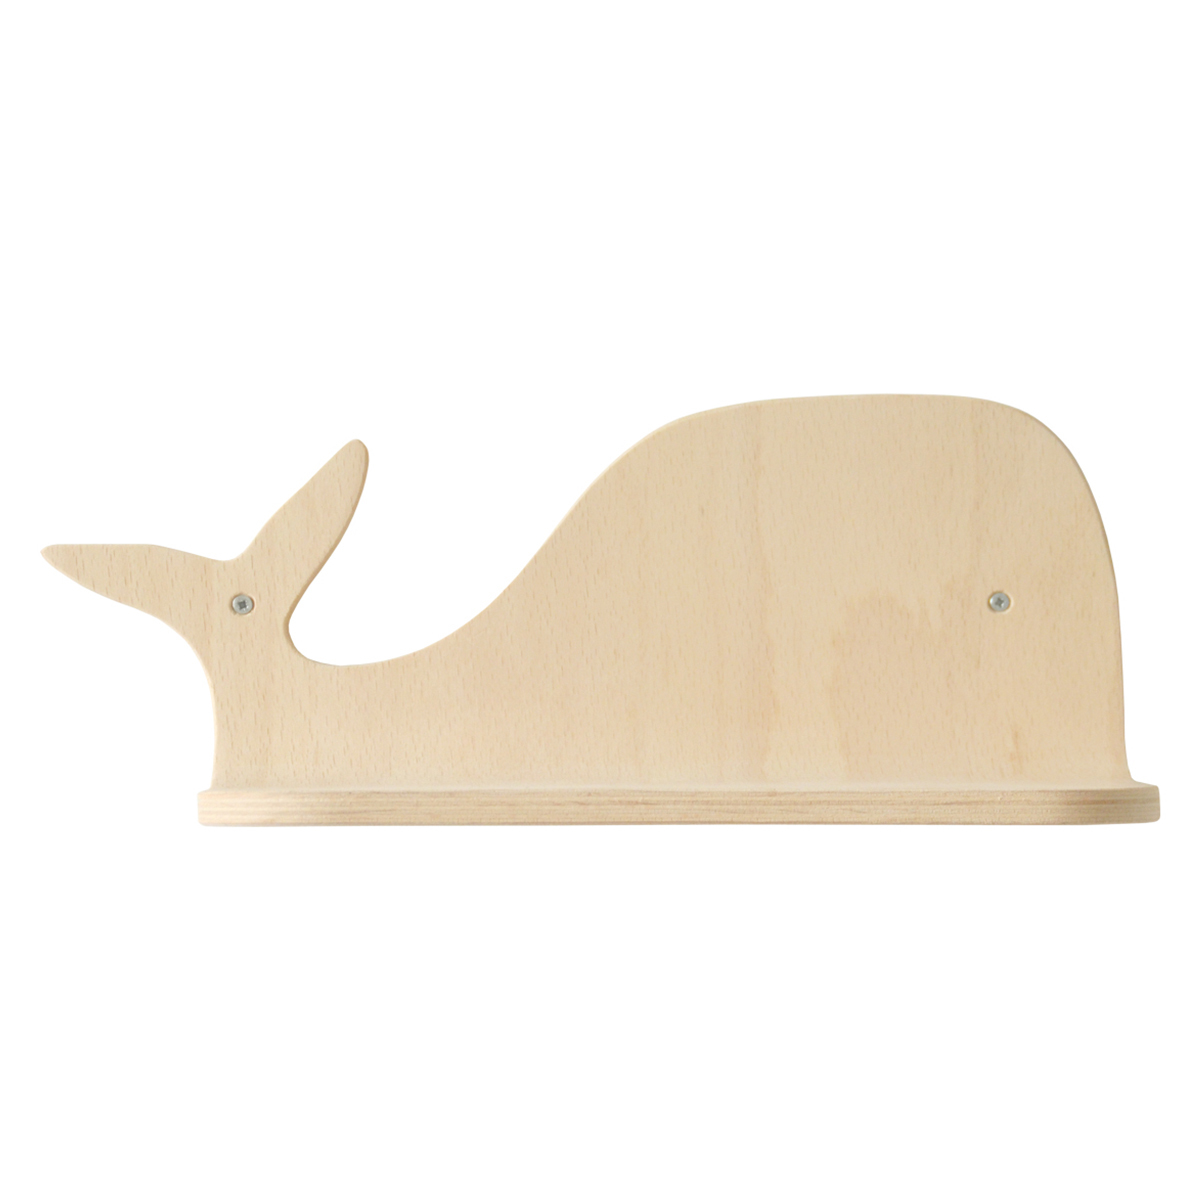 Étagère Étagère Baleine Popi - Naturel Étagère Baleine Popi - Naturel